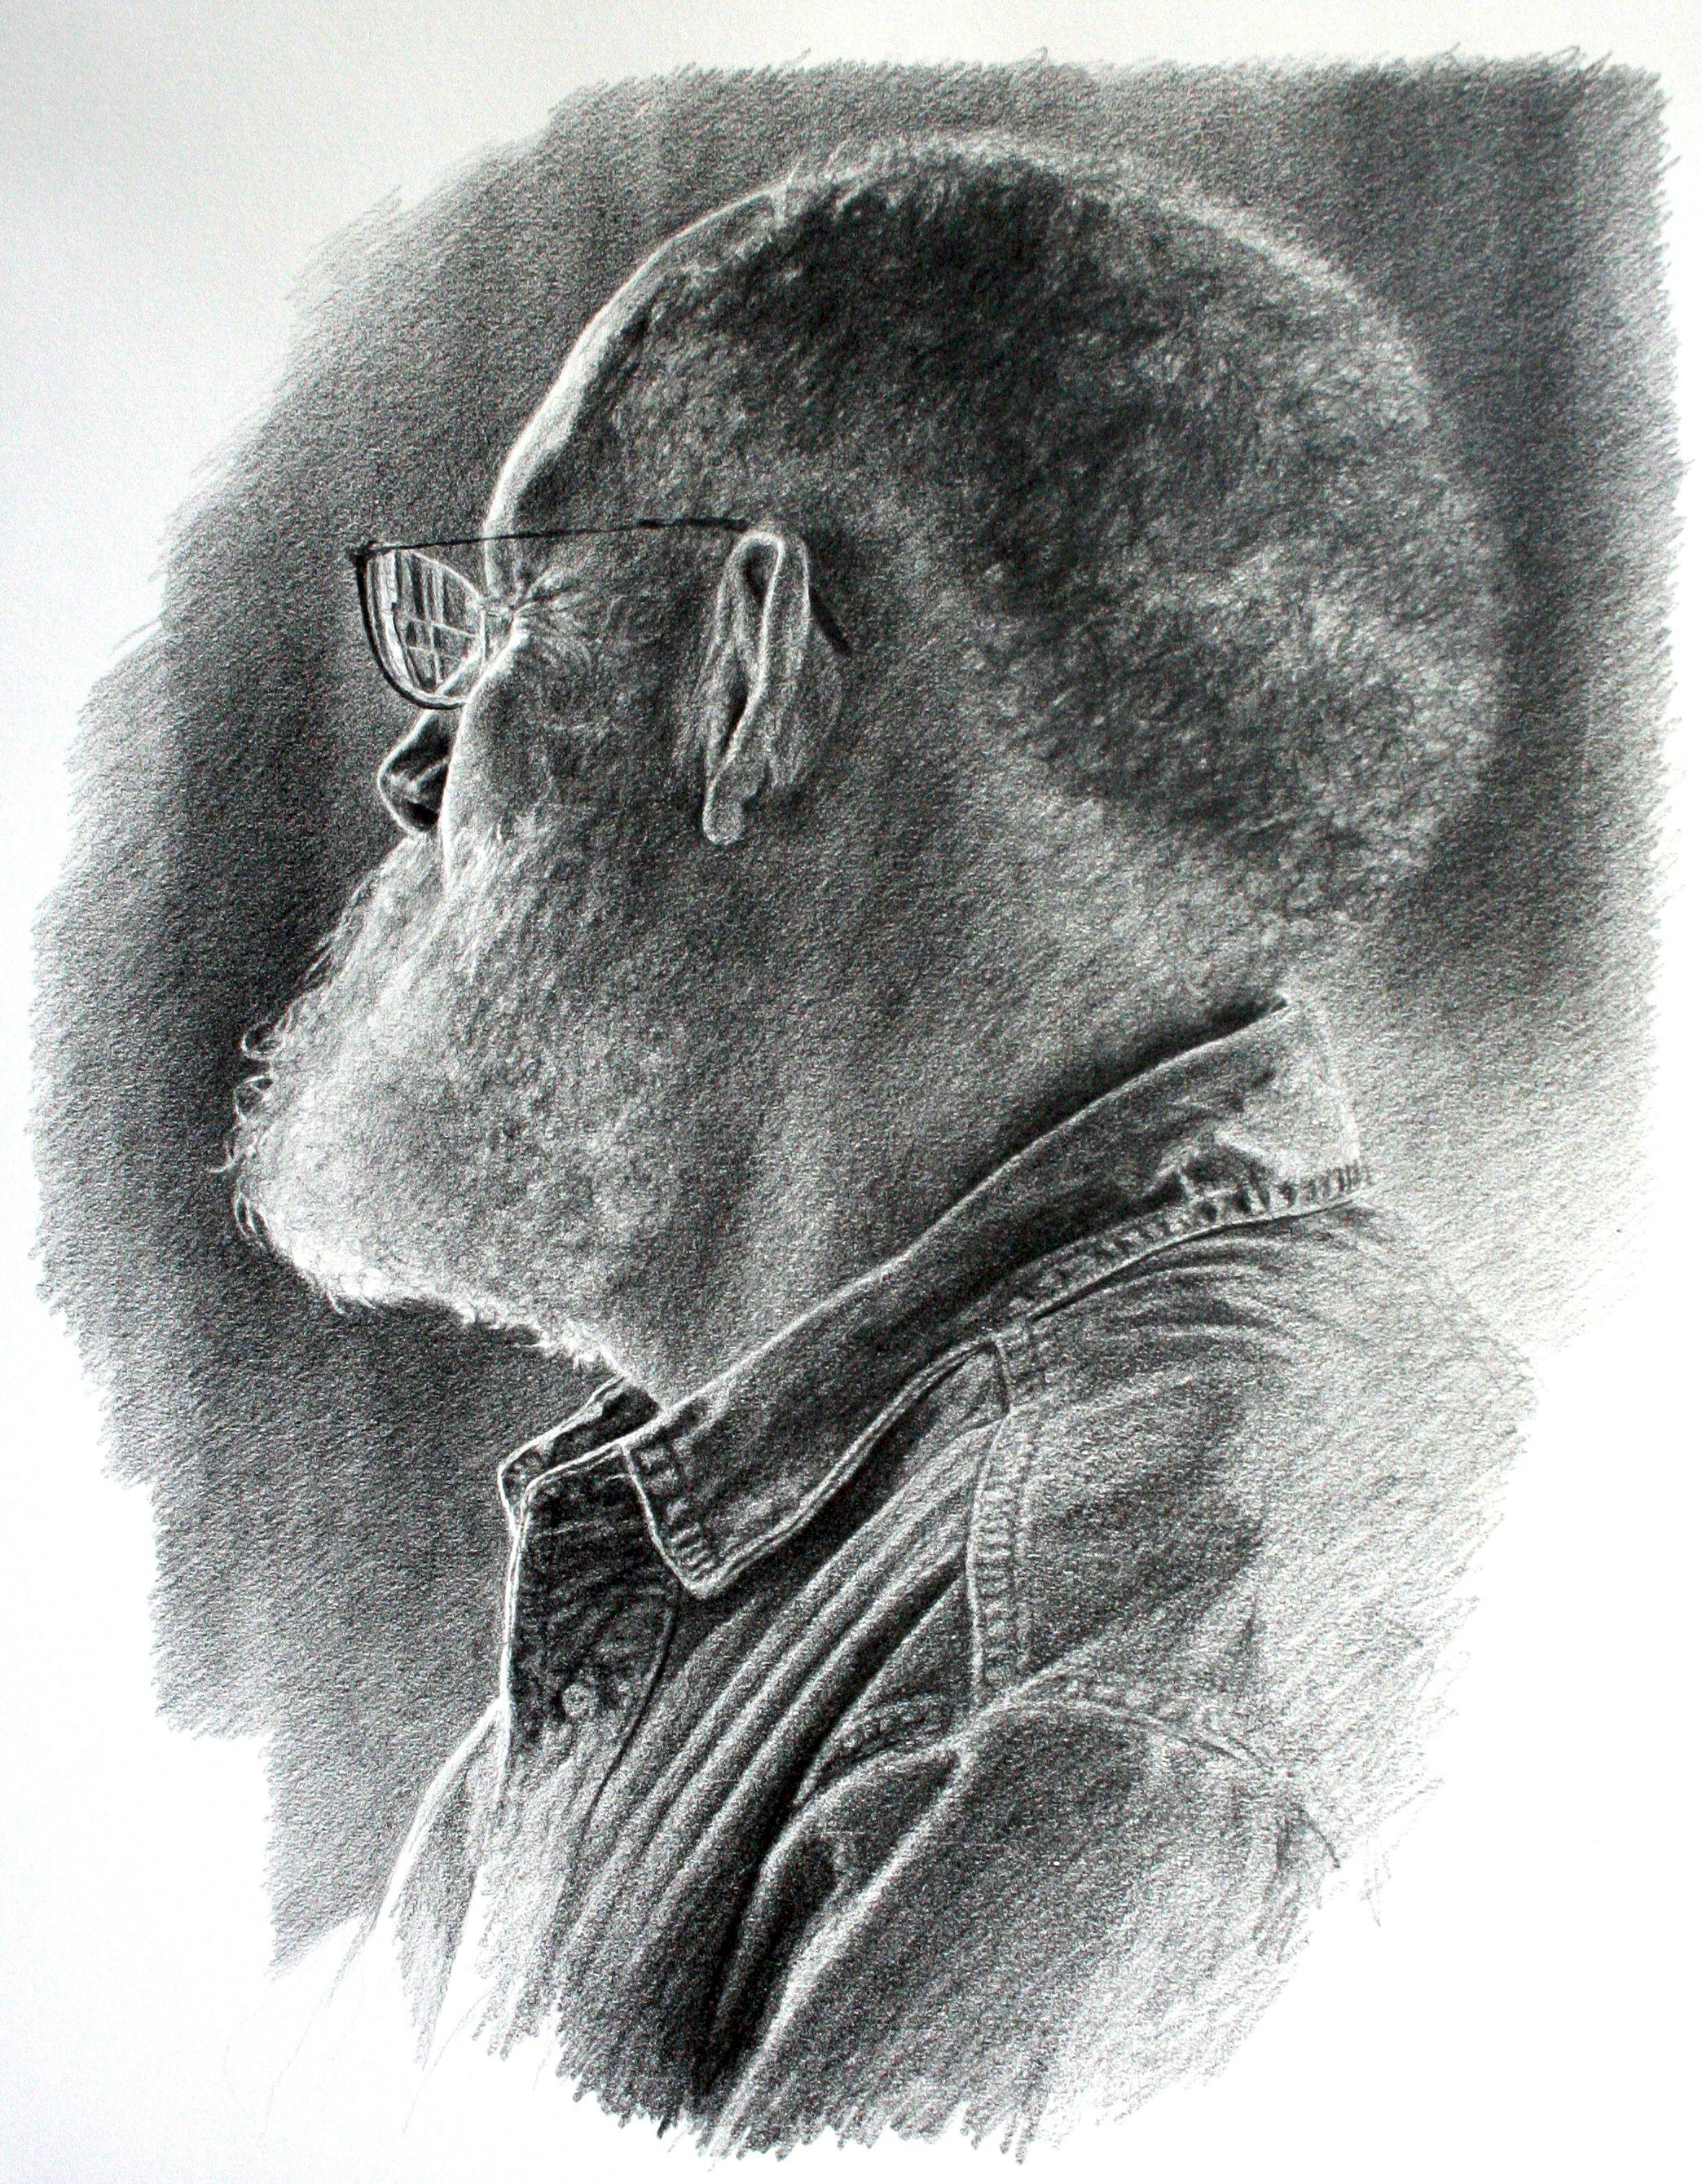 Carol Herren Foerster - Artist - Drew the sketch of Ernest on The Story pagehttps://www.facebook.com/pg/carolsartsite/posts/